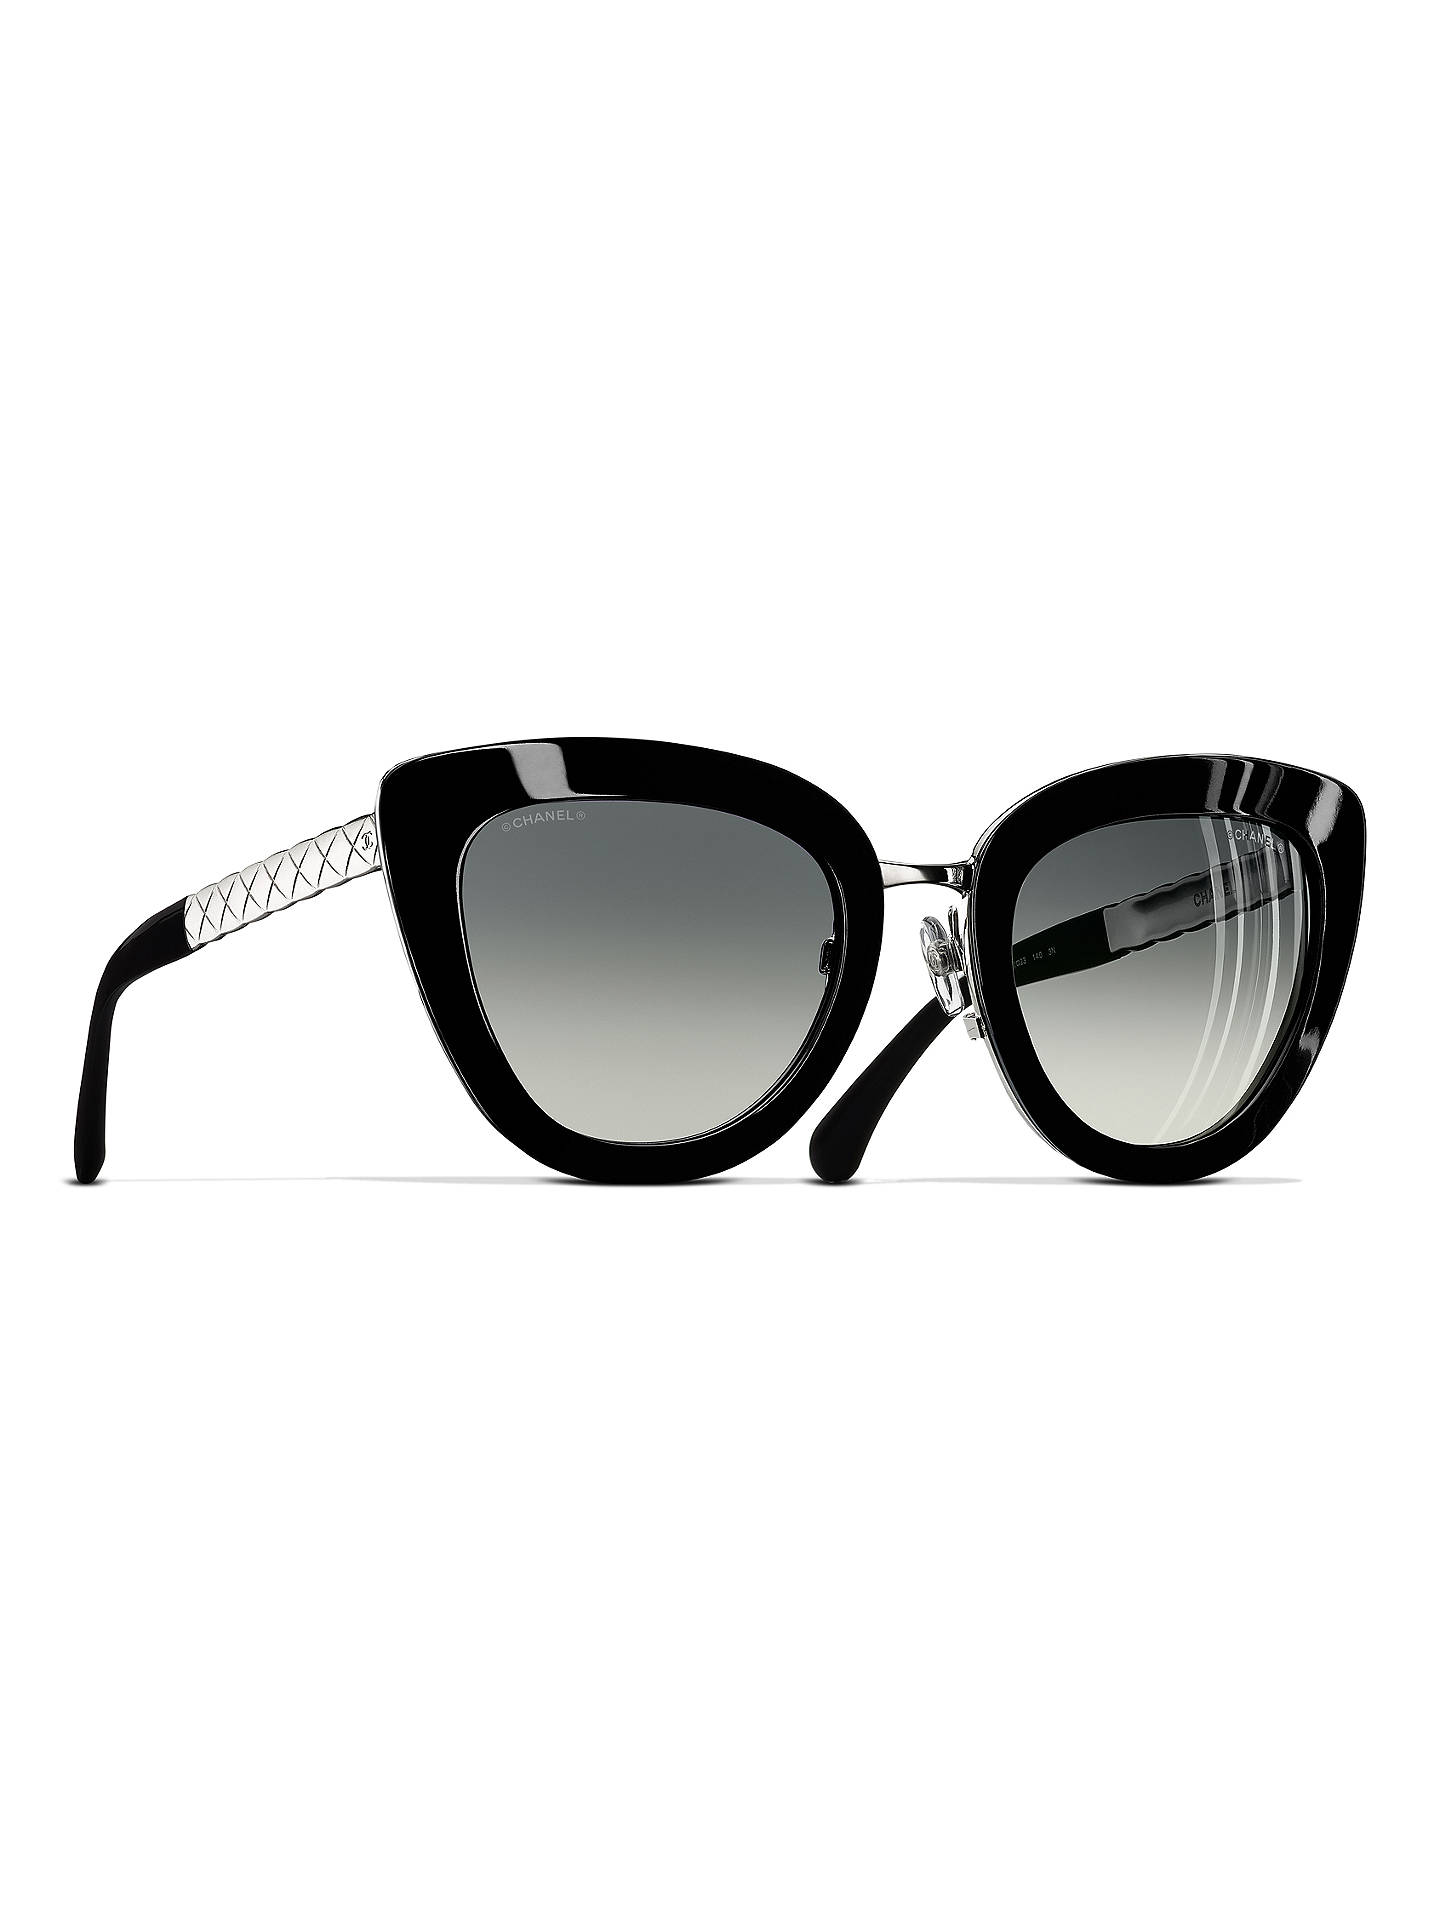 CHANEL Cat Eye Sunglasses CH5368 Black/Silver at John Lewis & Partners